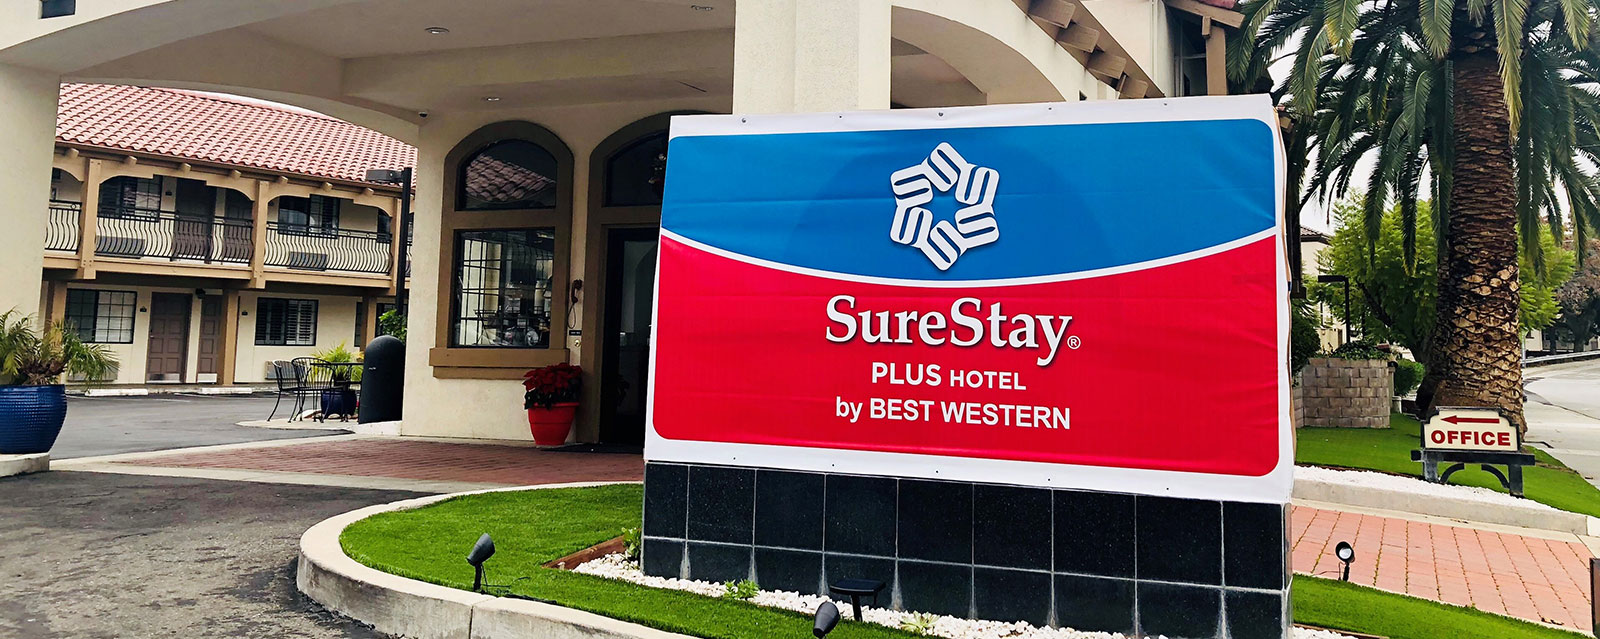 Hotel Near Santa Clara University San Jose Airport